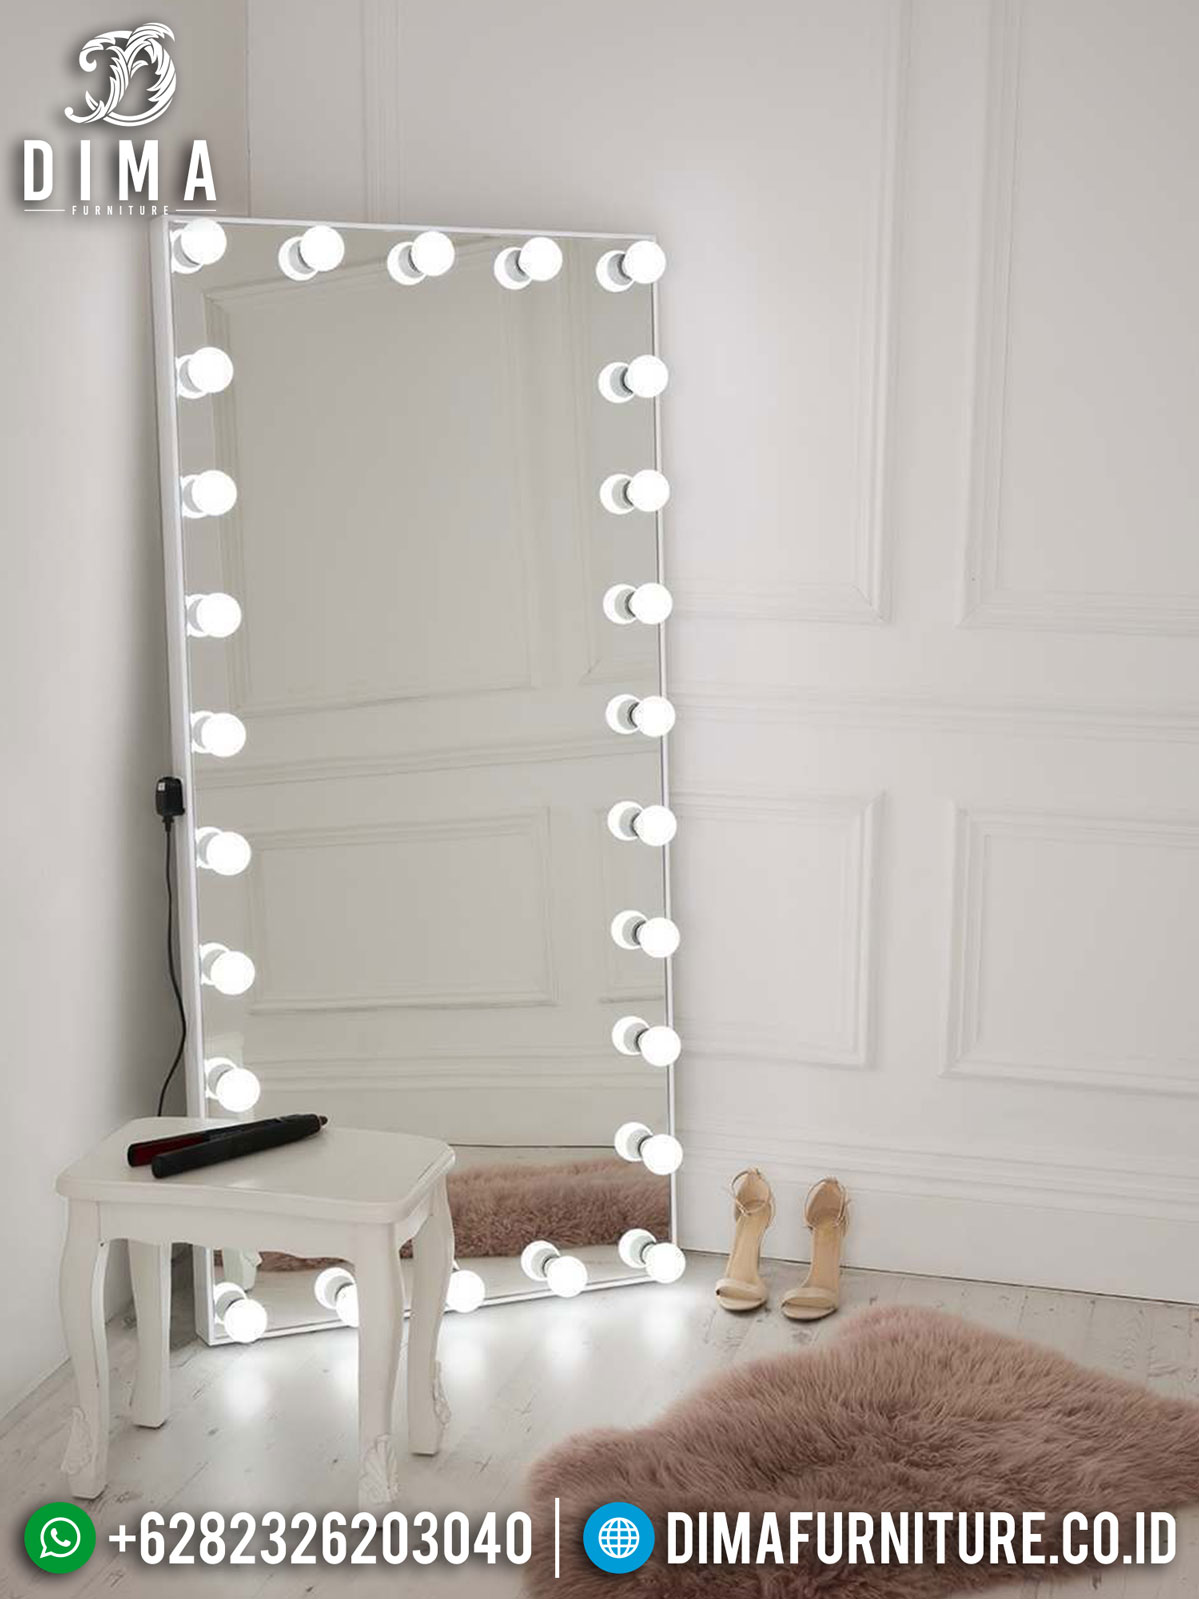 New Cermin Hias Minimalis Lampu Design Fiting Room Inspiring TTJ-1299